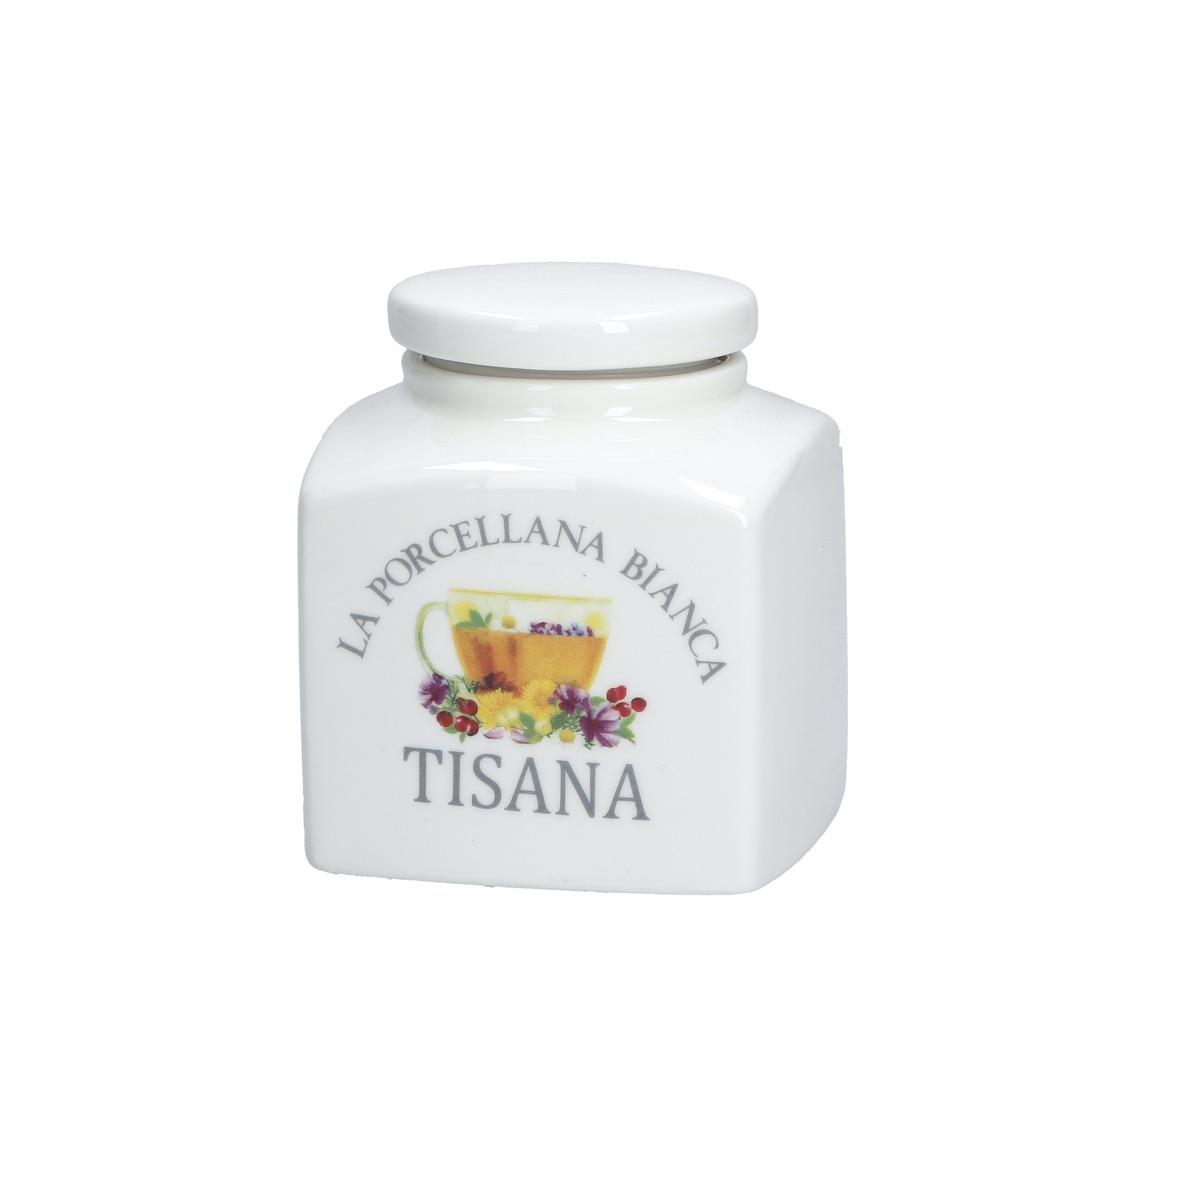 Conserva barattolo déco tisana